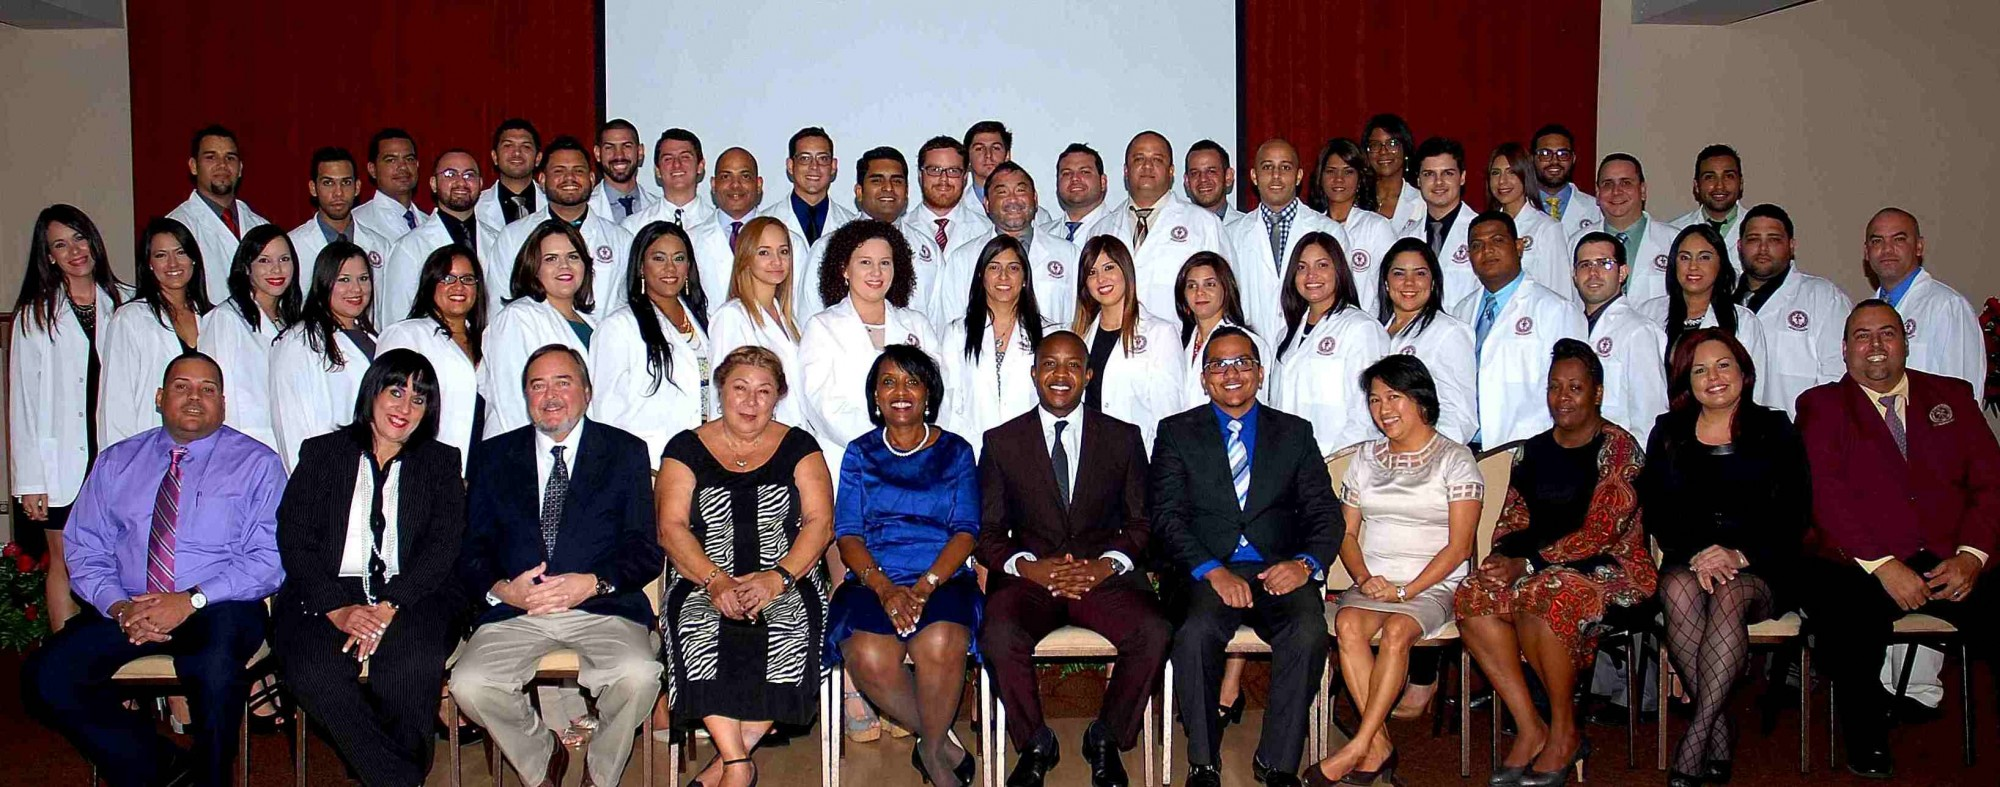 Mayaguez Medical Center Puerto Rico Mayaguez Medical Center in